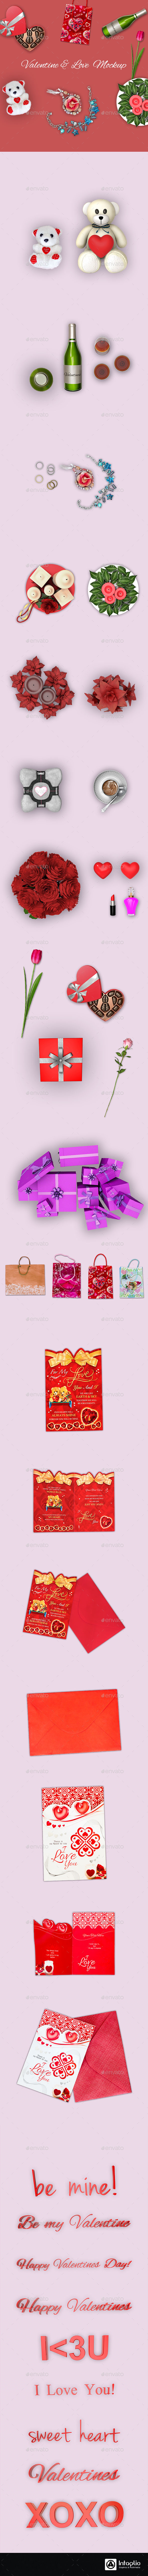 Valentine Love Assets & Mockup - Product Mock-Ups Graphics